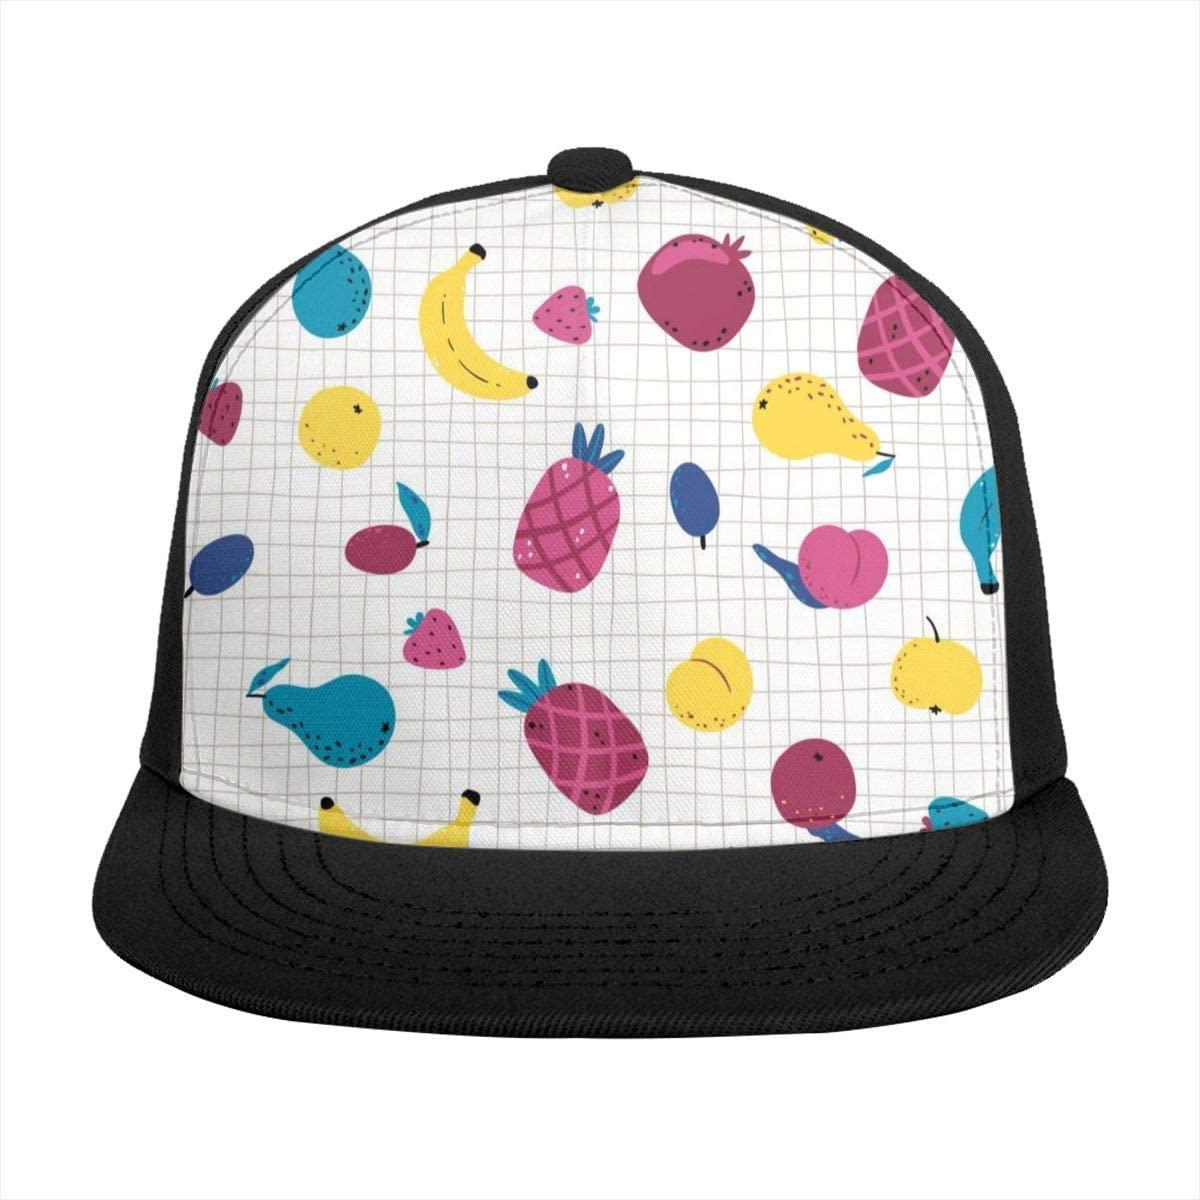 Flat Brim Hat Plaid Pineapple Pear Banana Peach Baseball Cap Sun Visor Hat for Women Men Teen Boys Girls